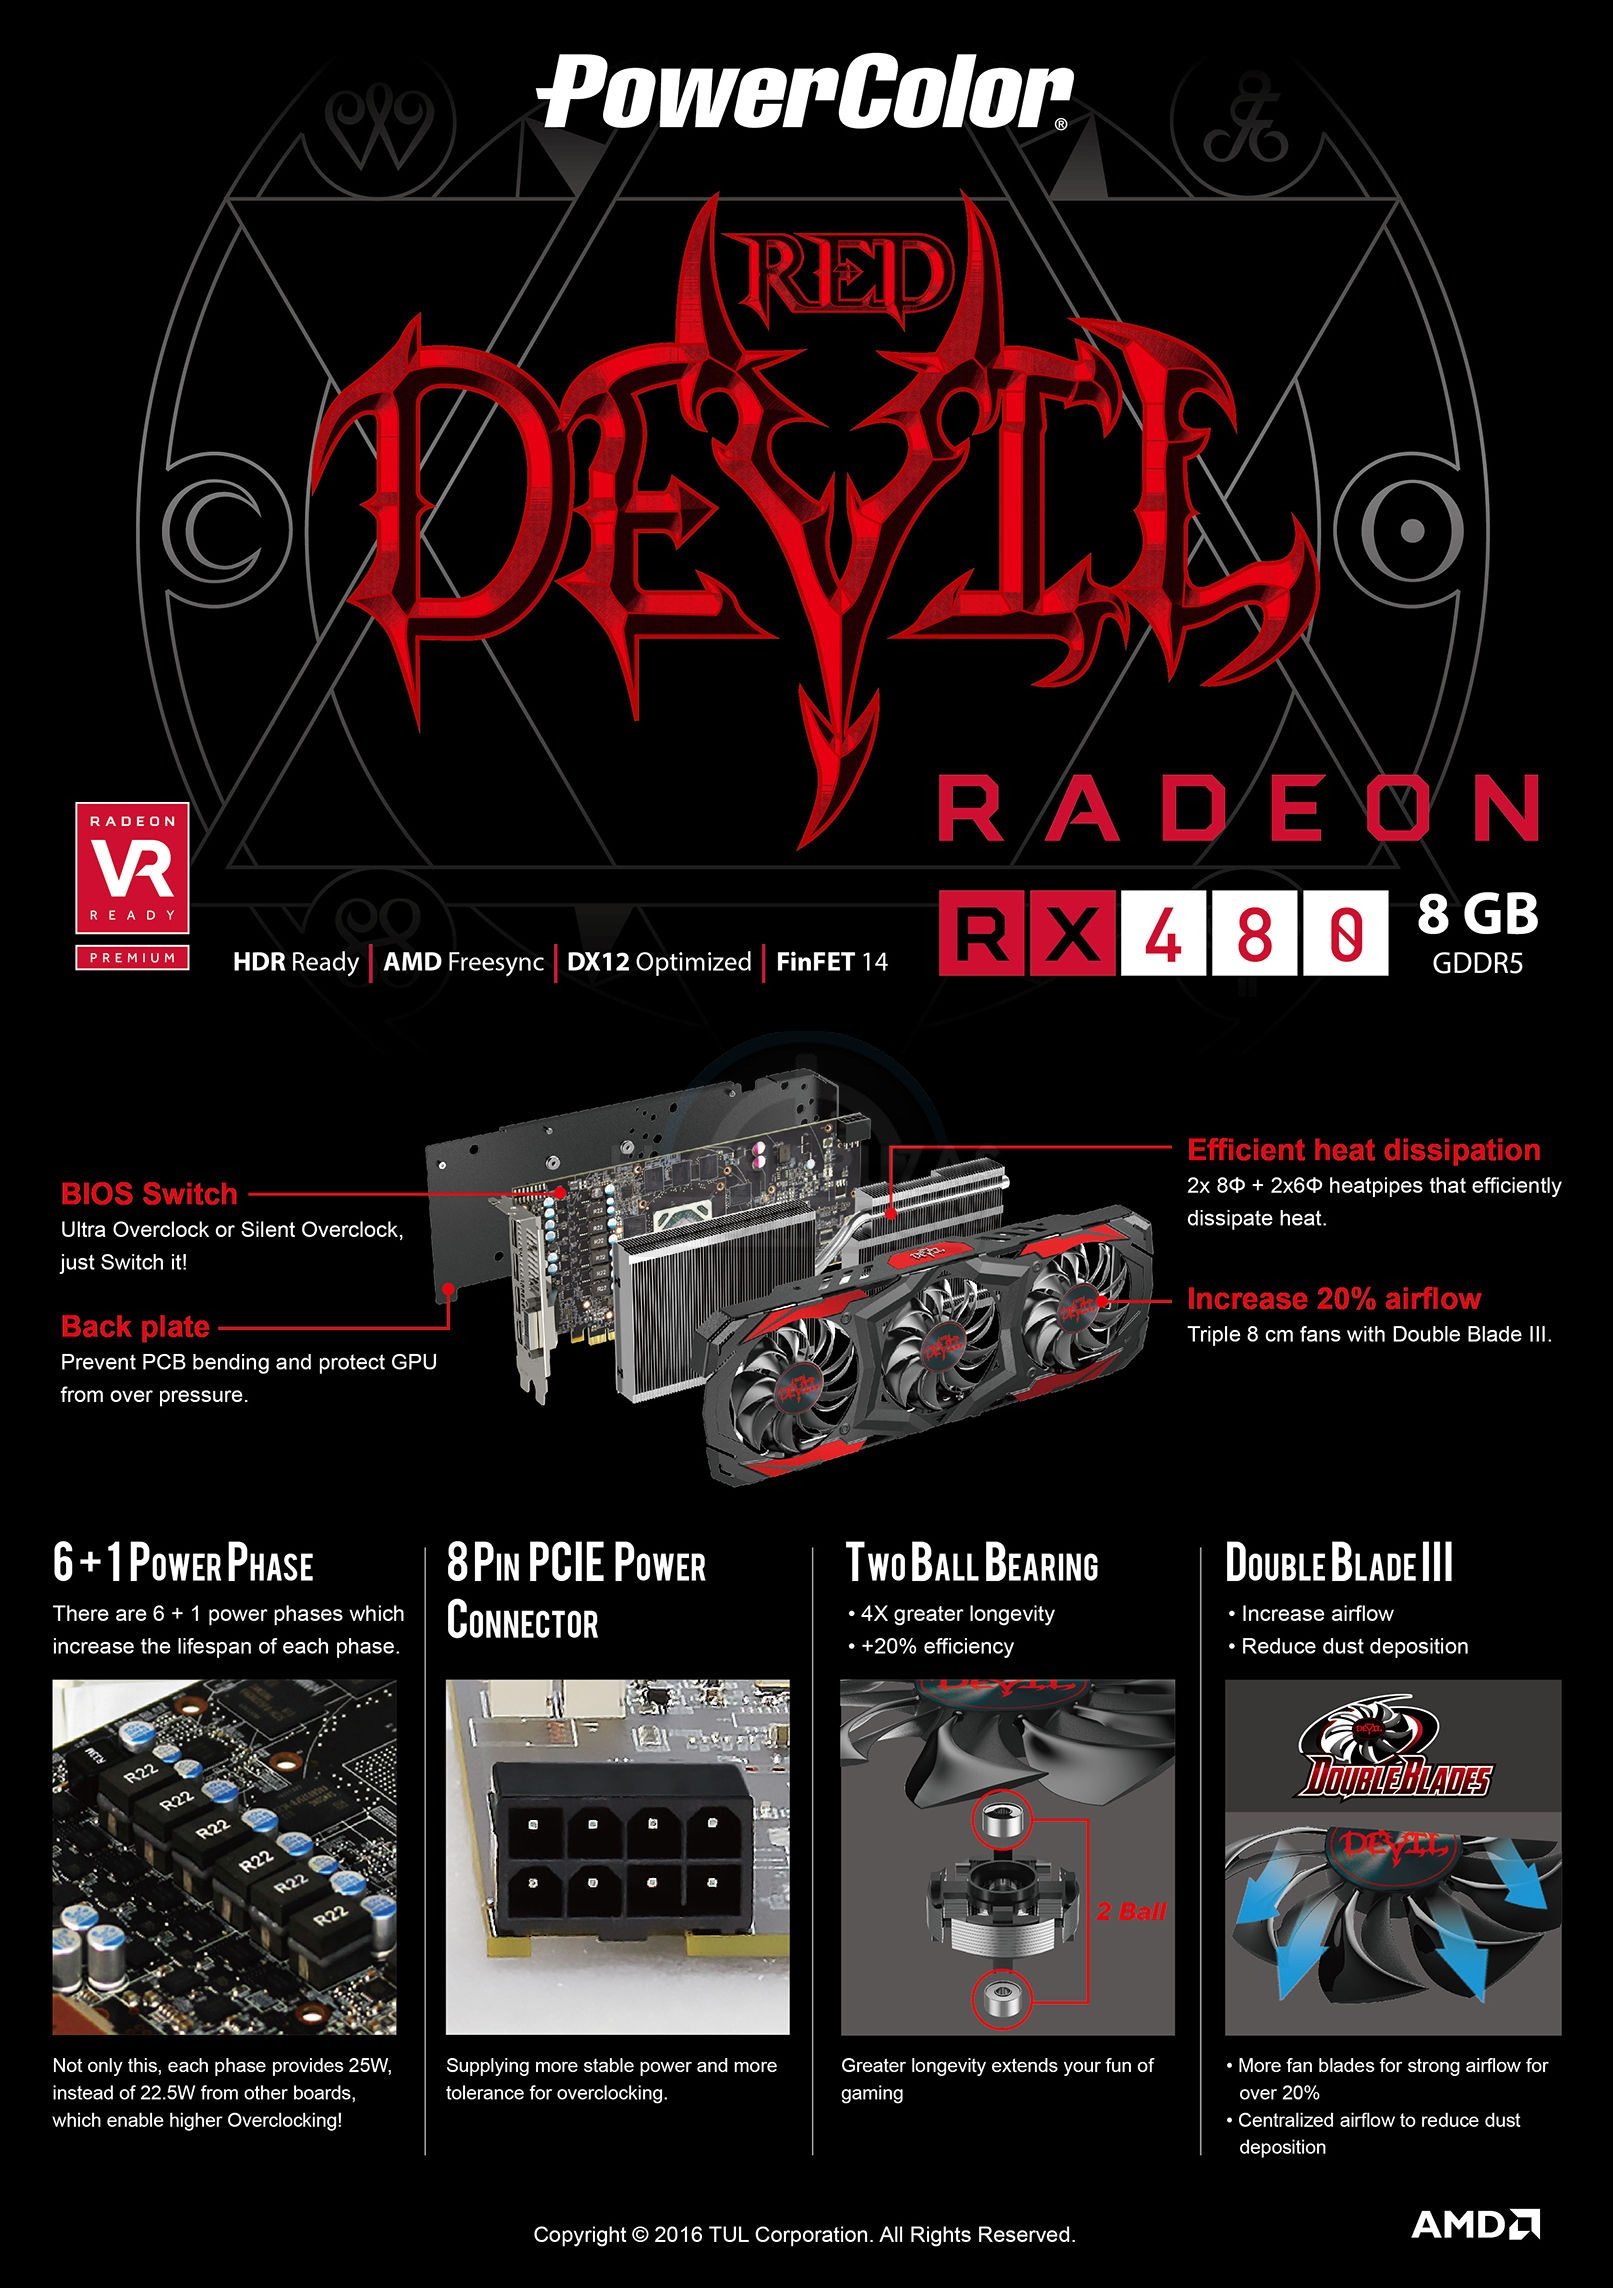 PowerColor Red Devil RX 480